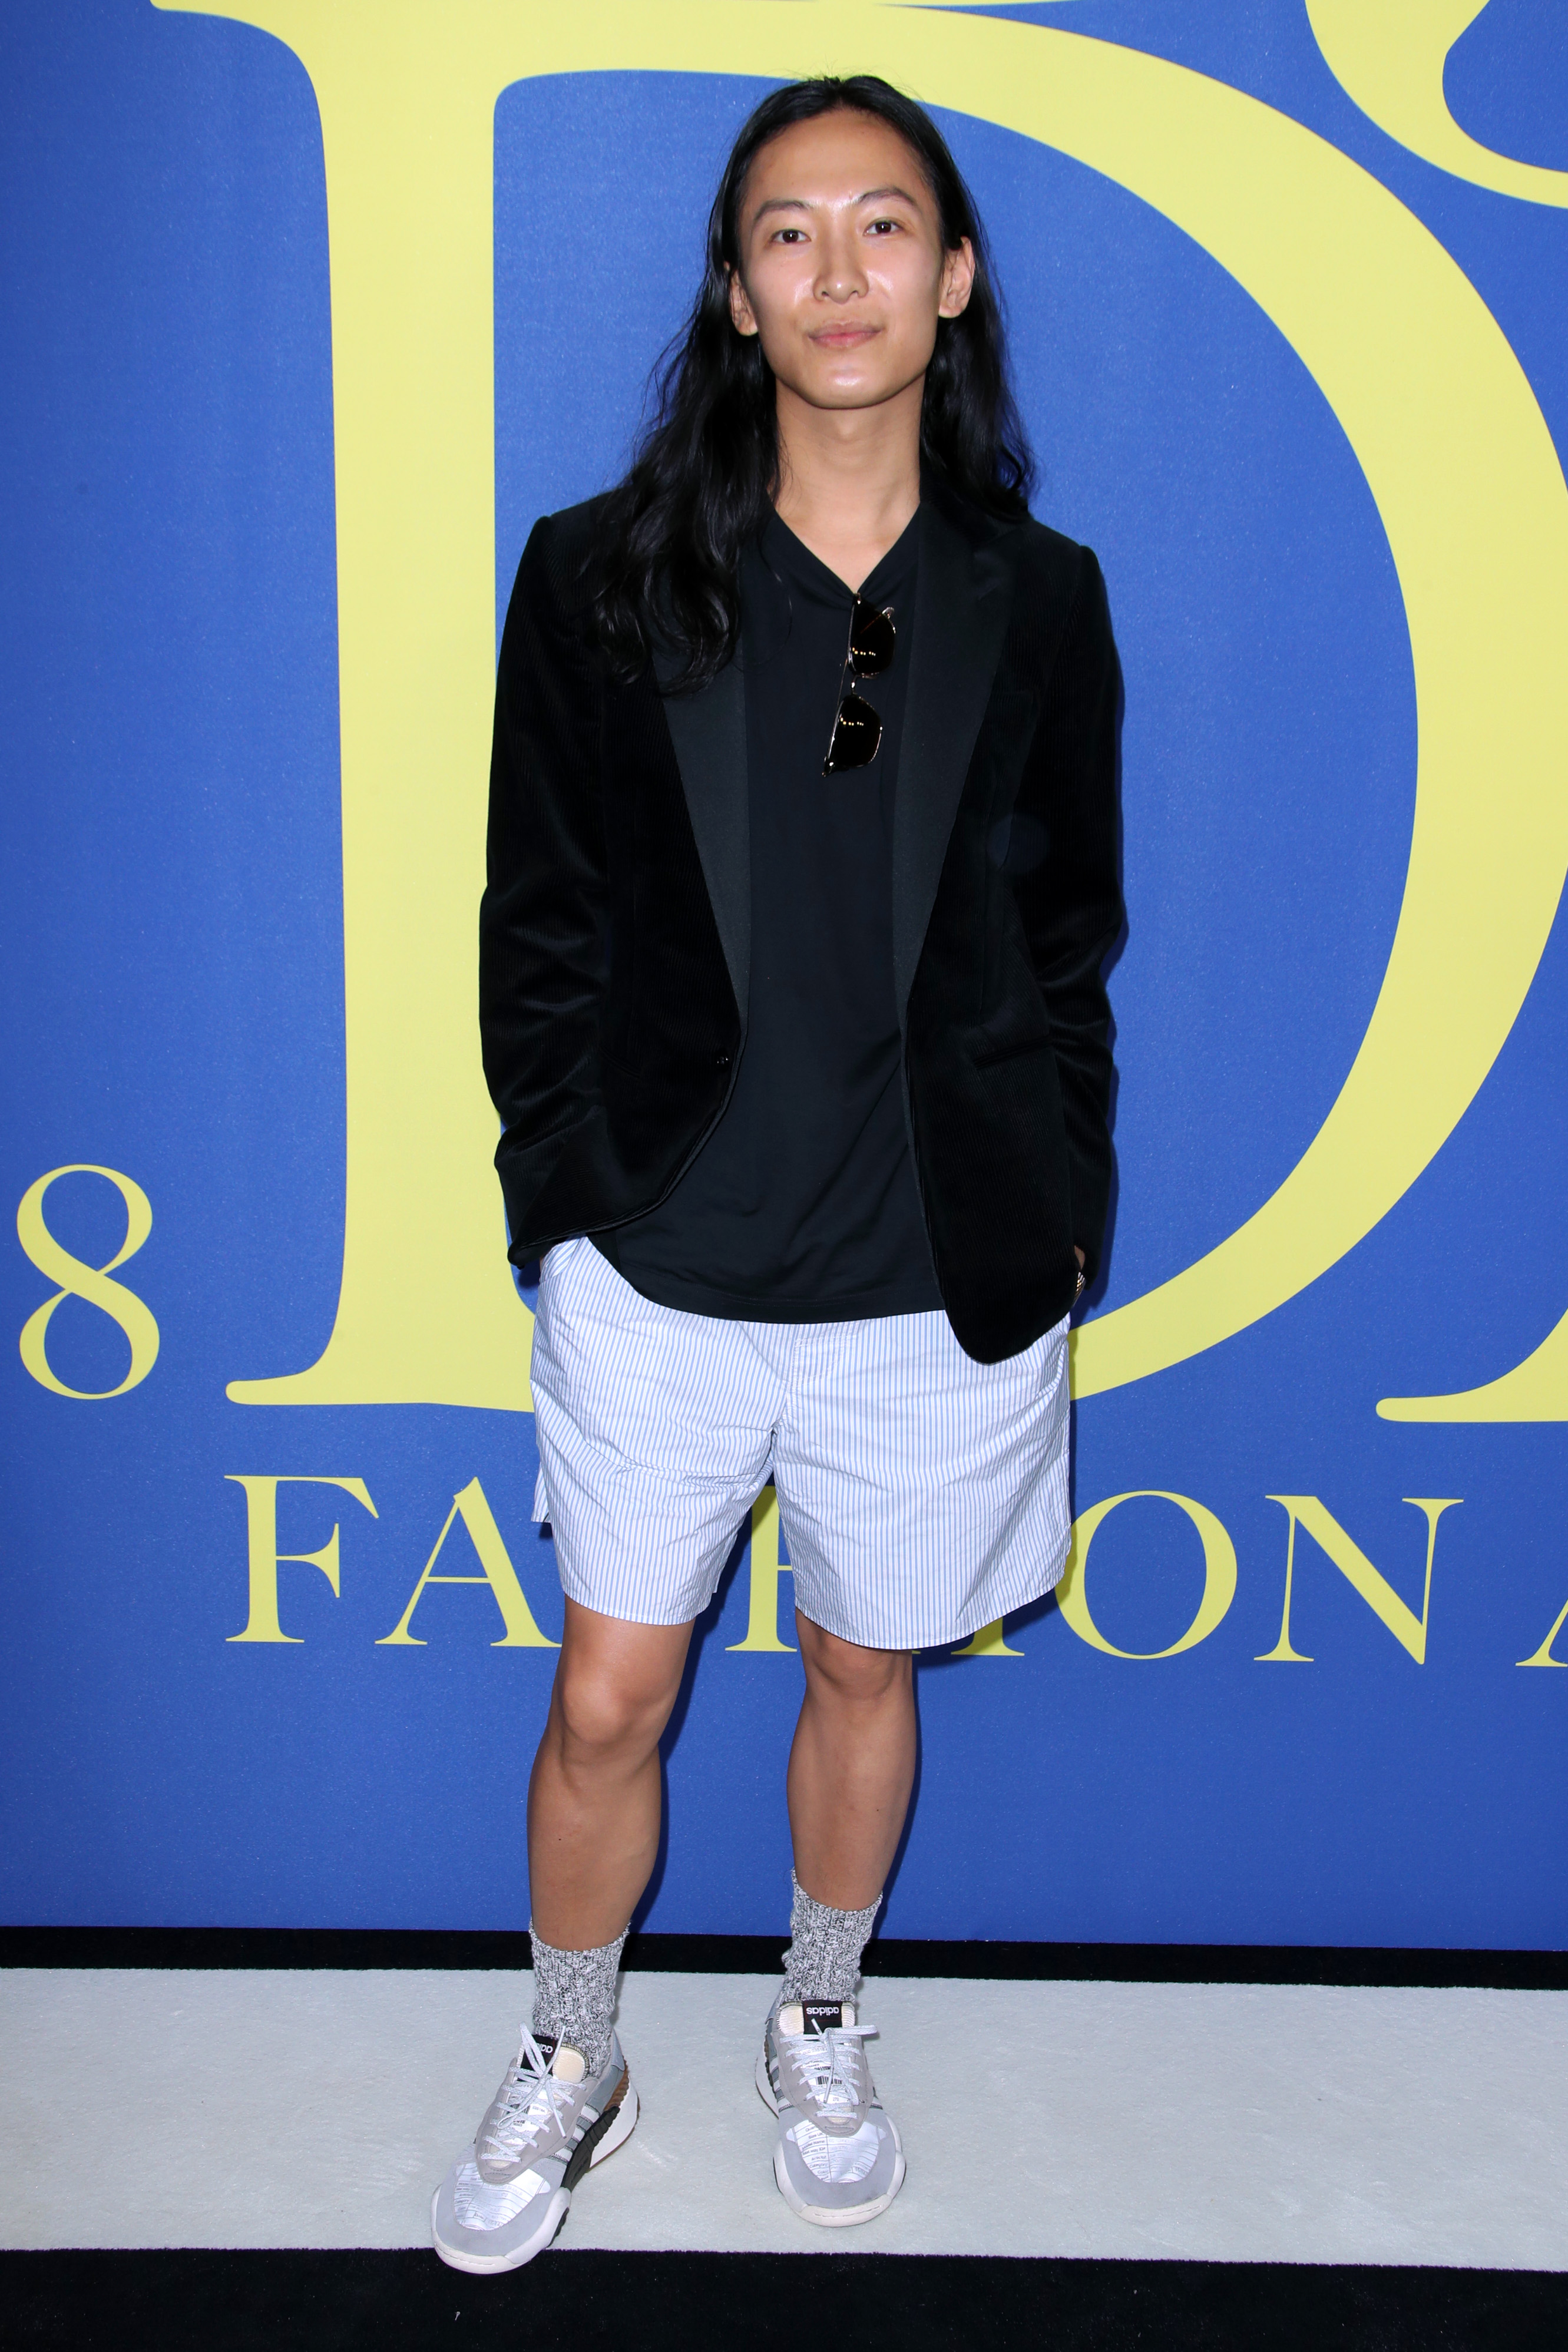 Alexander Wang, CFDA Fashion Awards, Arrivals, New York, USA - 04 Jun 2018